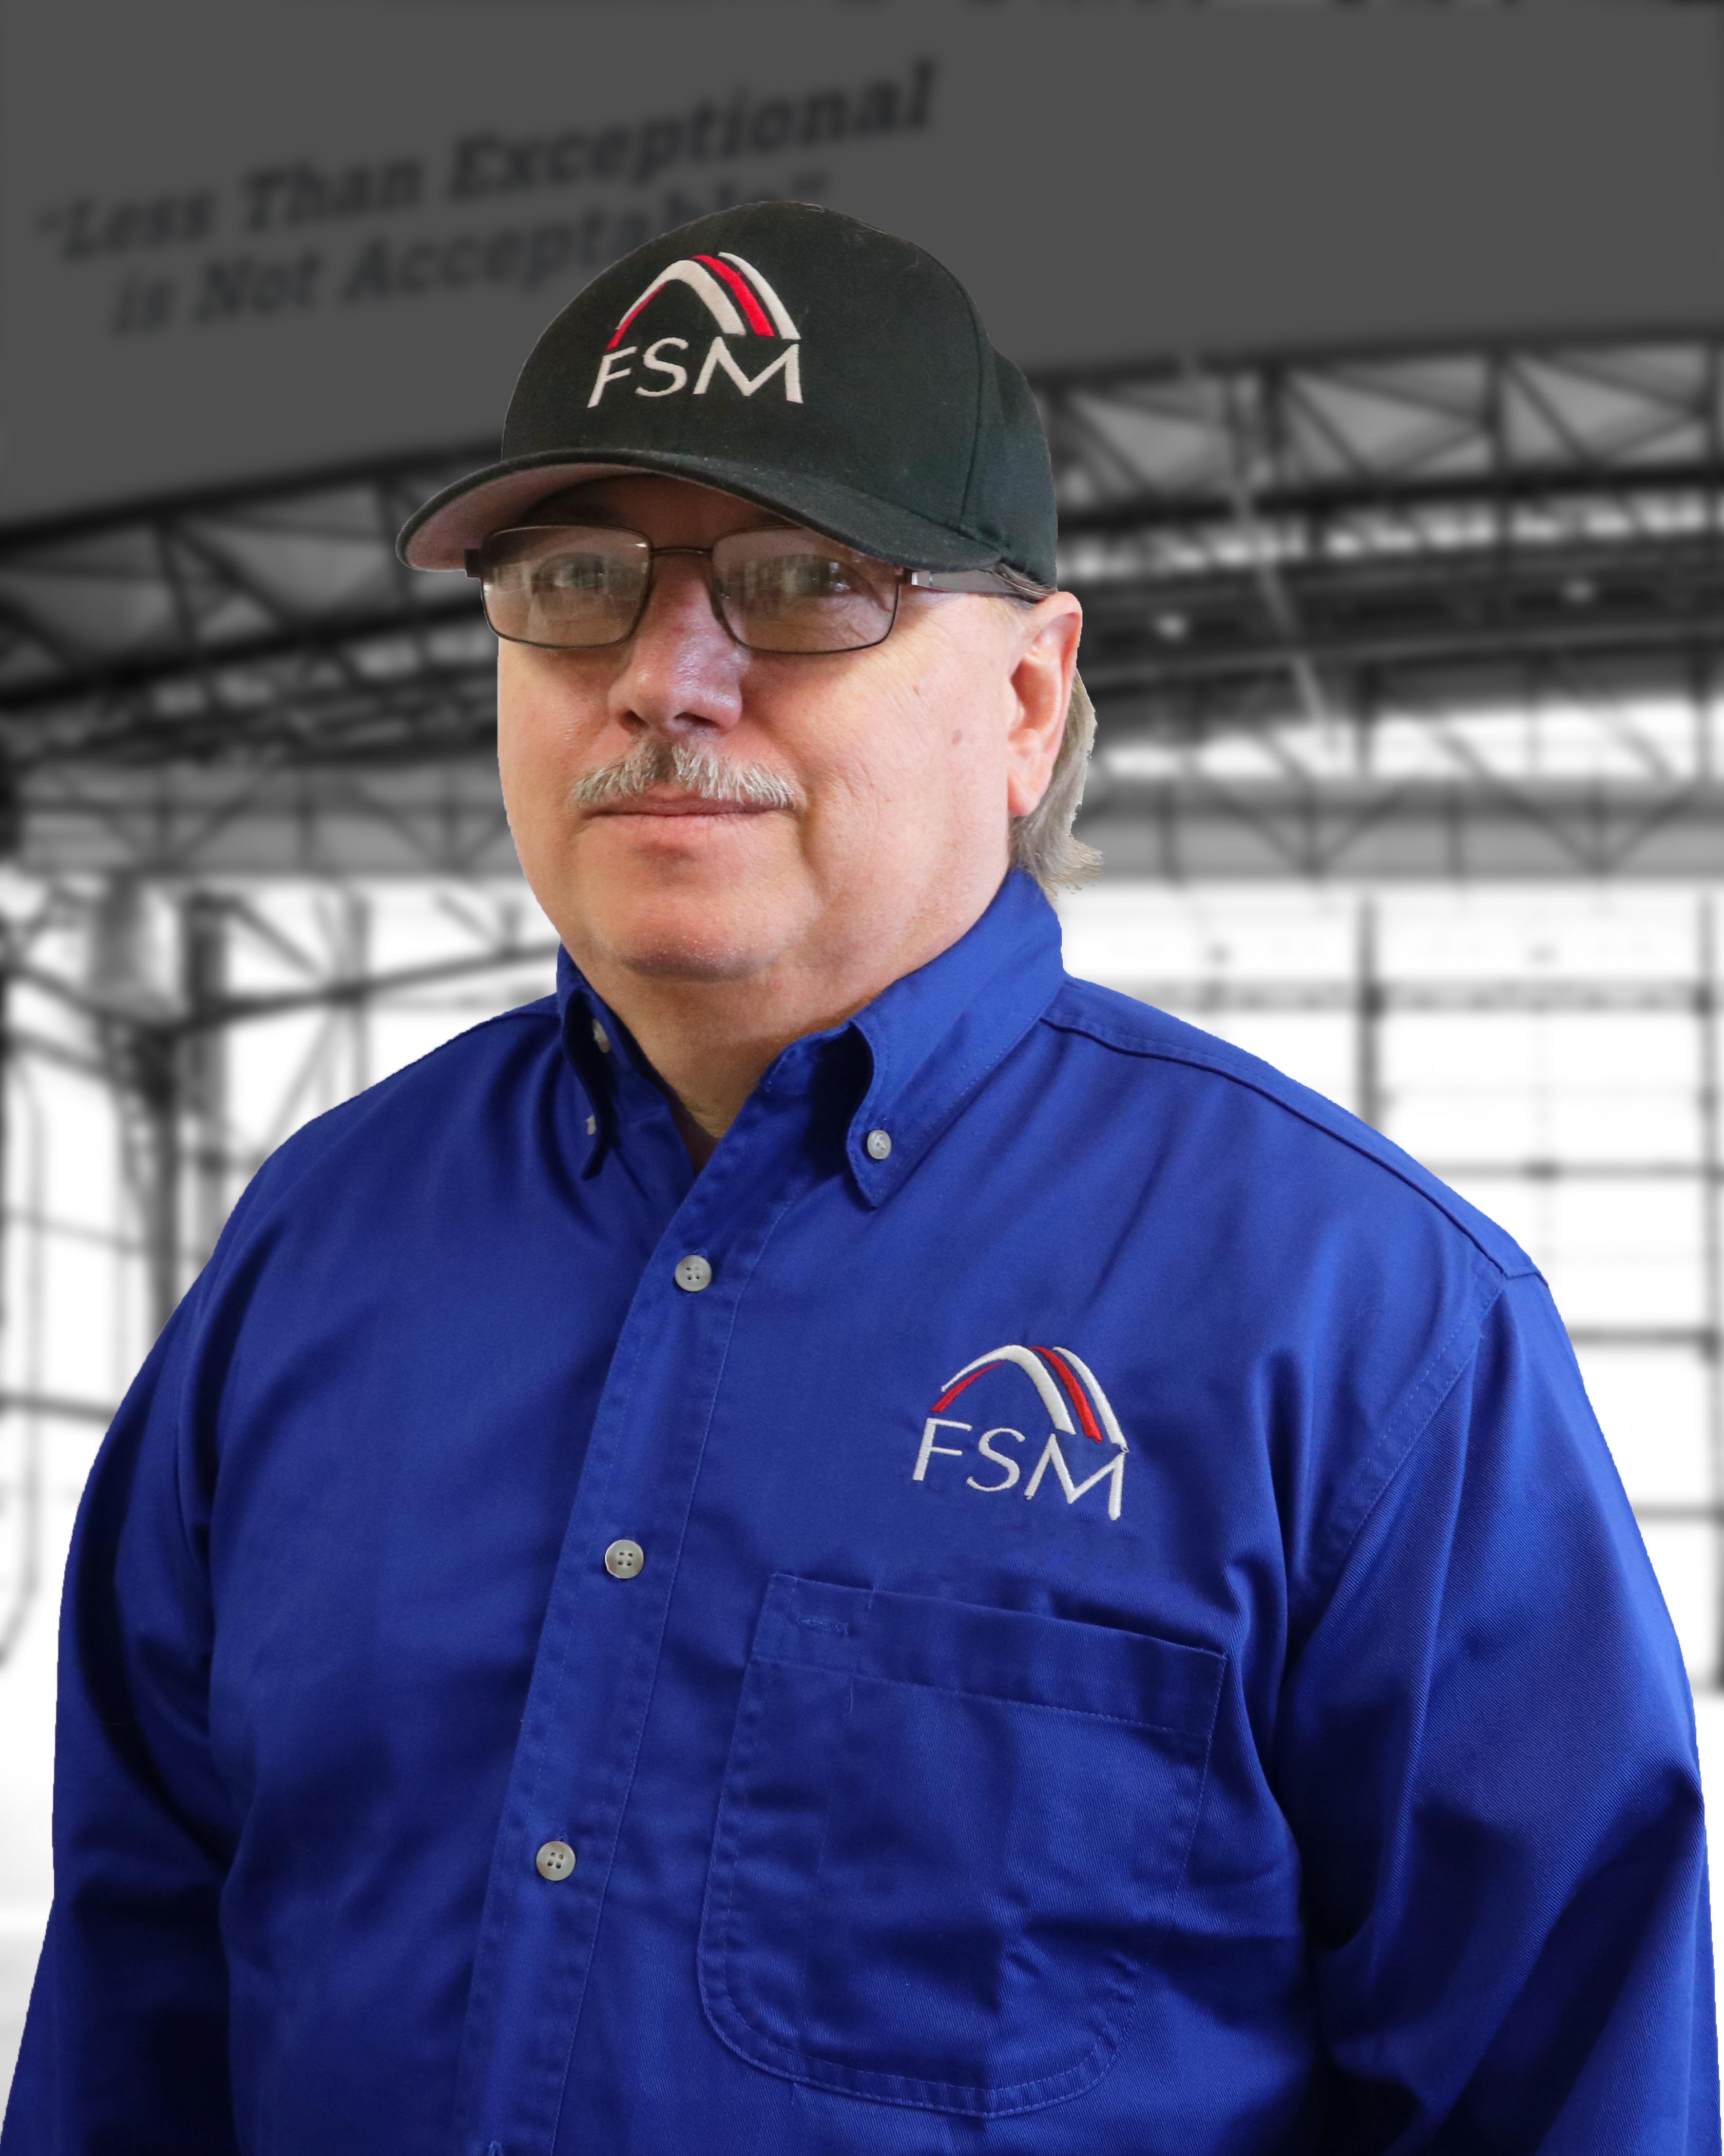 FSM Thomas Dean Warehouse Associate